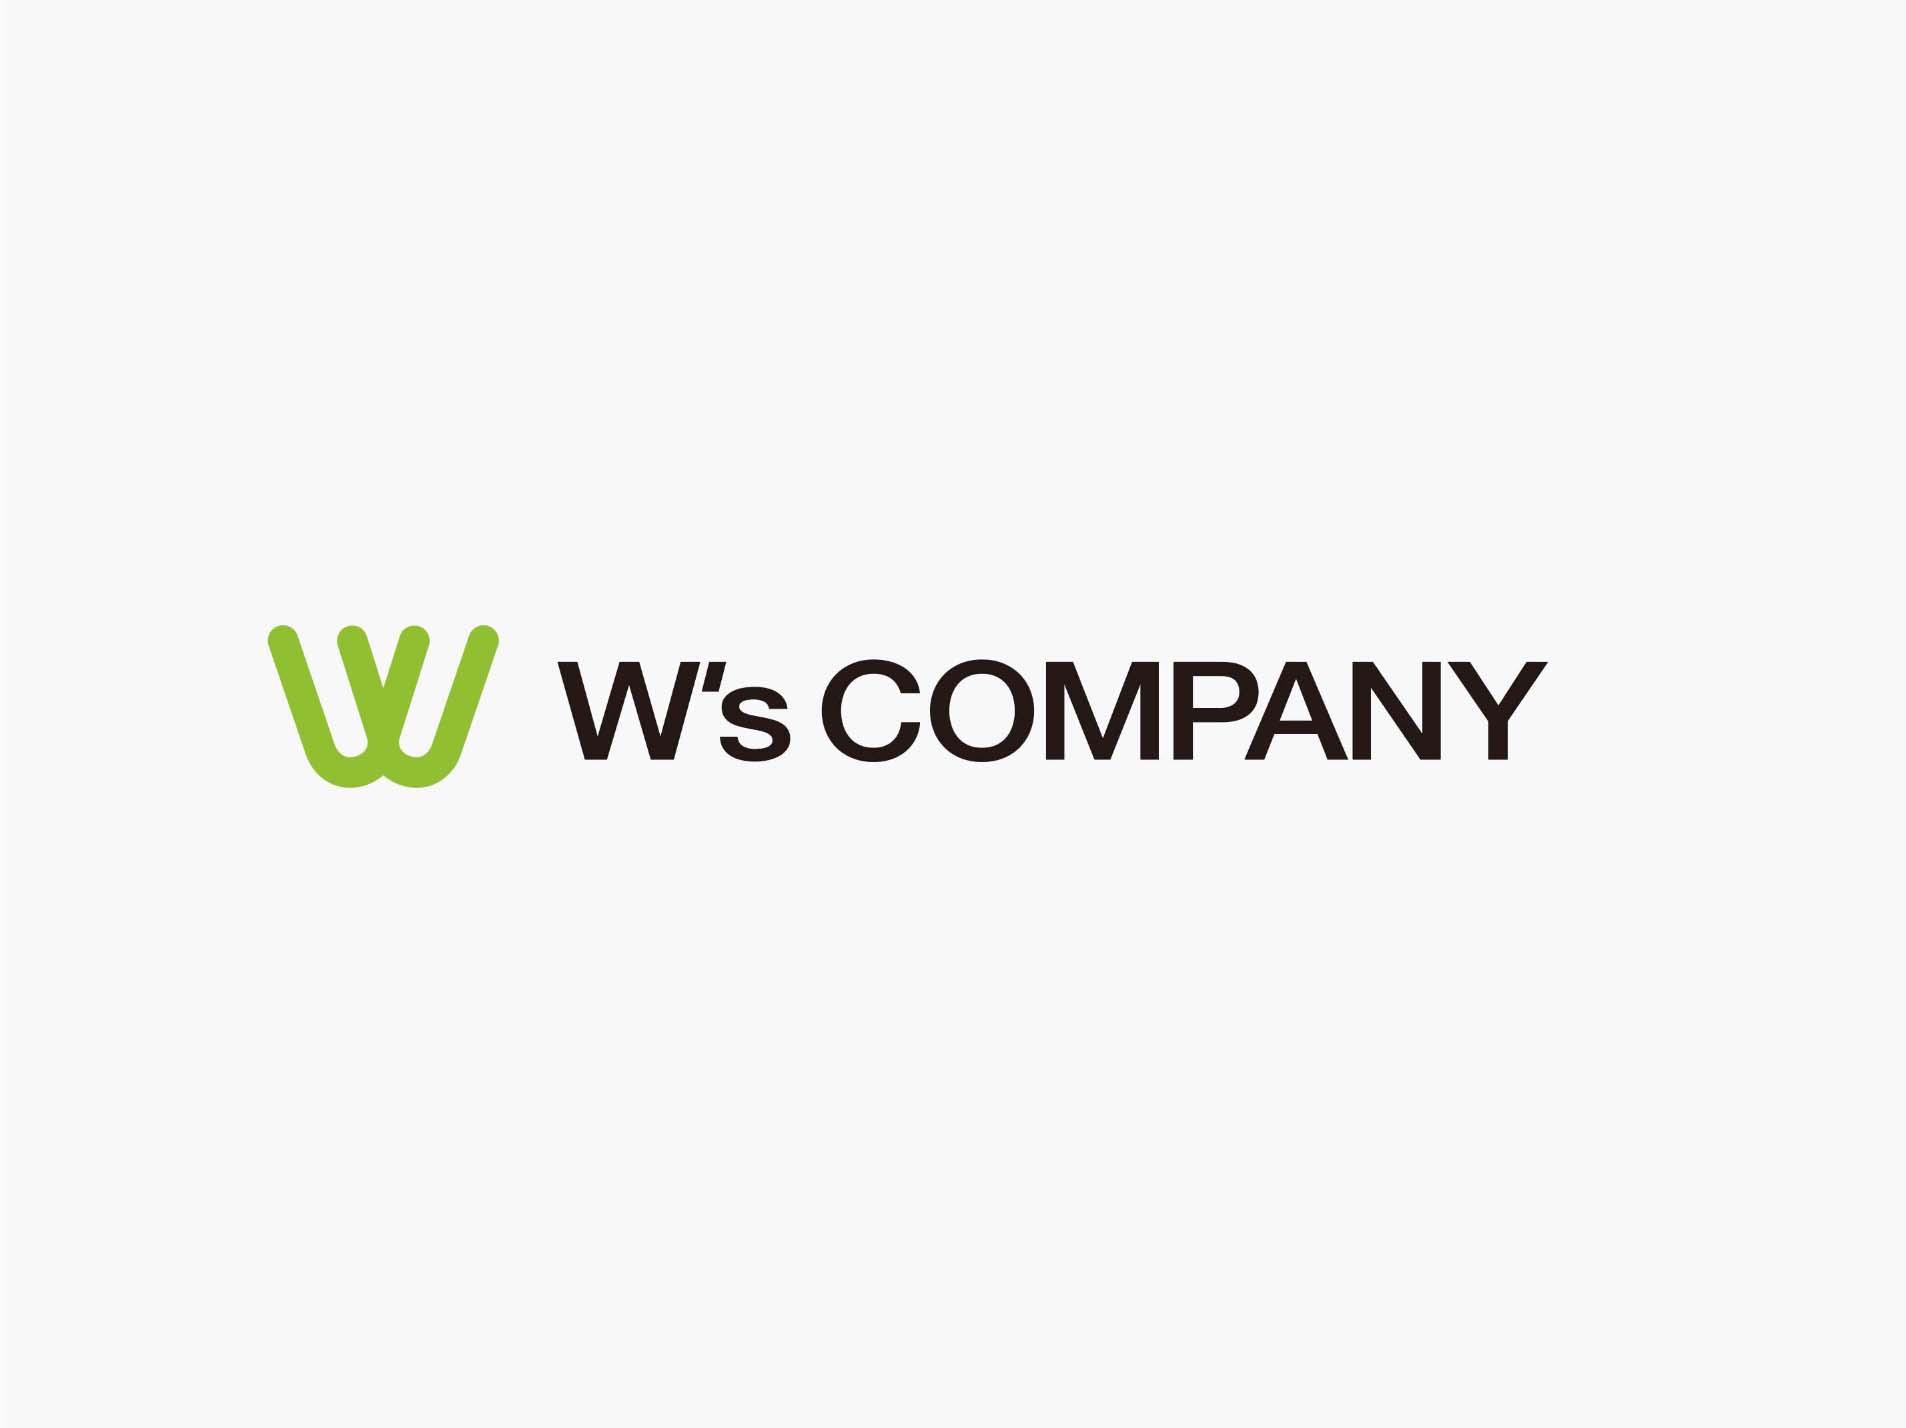 ws company branding